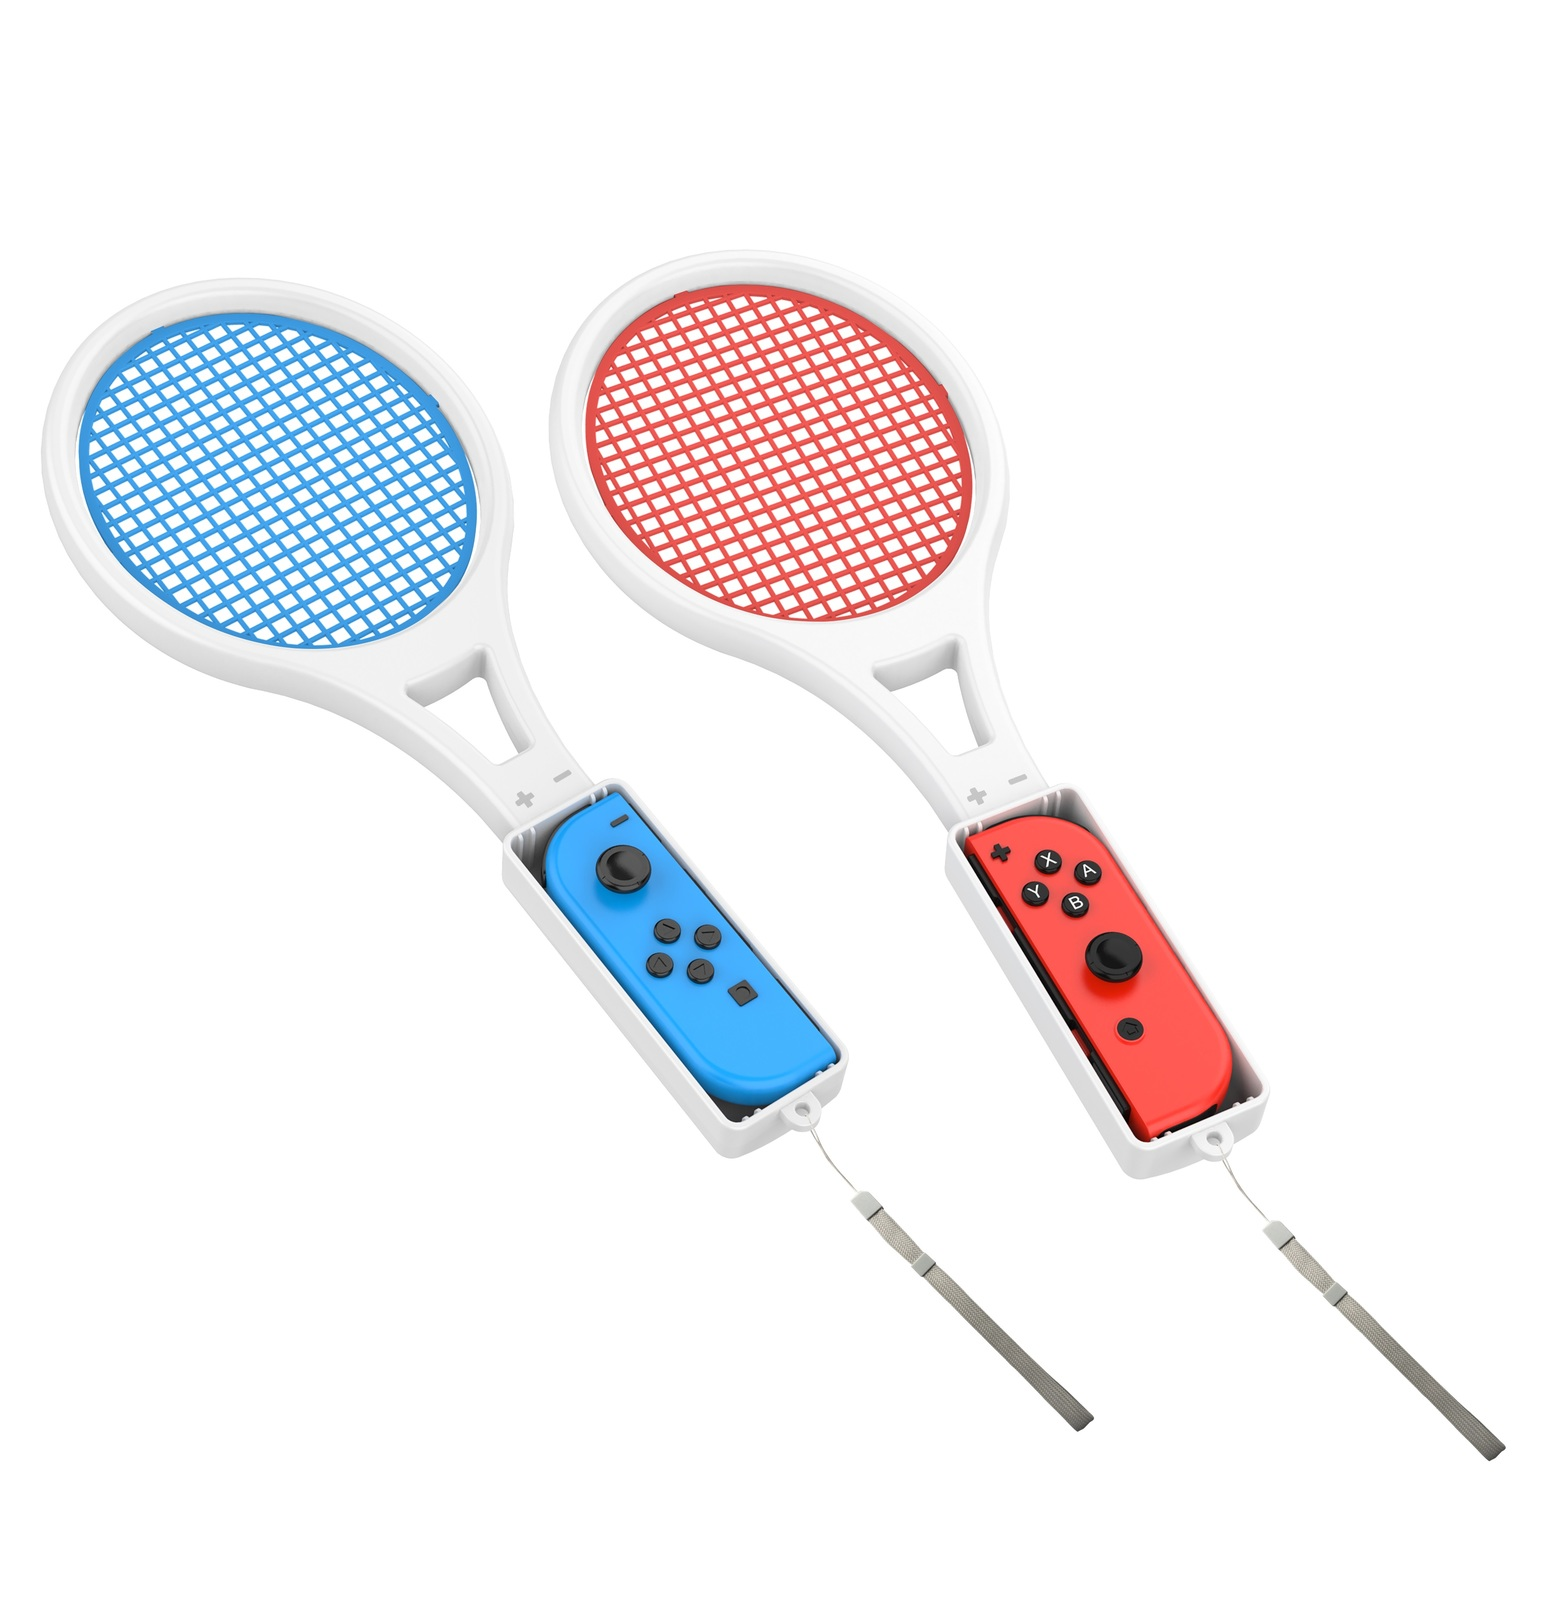 Powerwave Nintendo Switch Joy Con Tennis Racquet Twin Pack for Nintendo Switch image